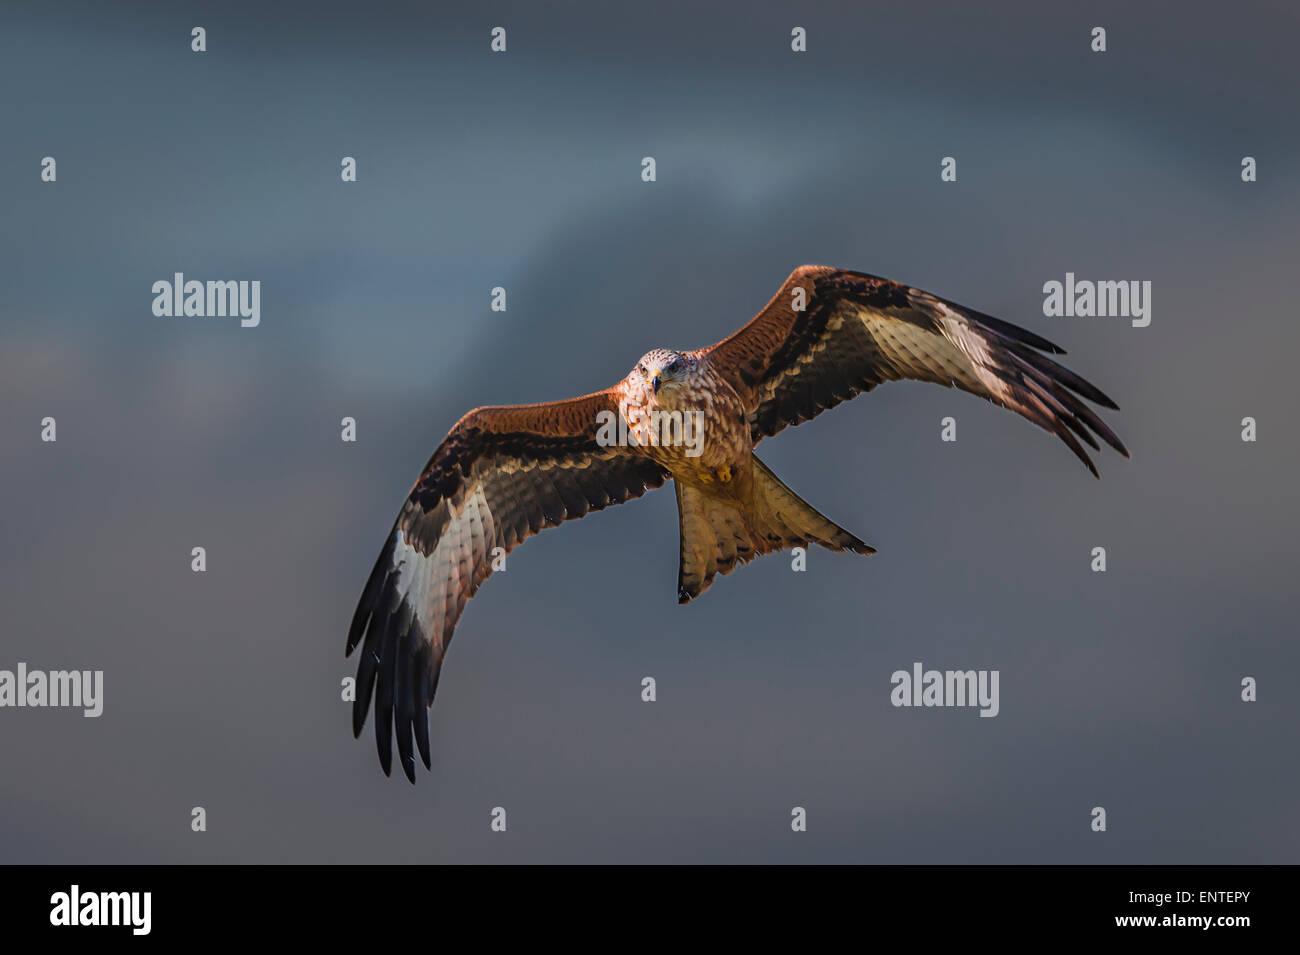 Red Kite (Milvus milvus), Dumfries and Galloway, Scotland, UK - bird flying, raptor, falcon, hawk - Stock Image